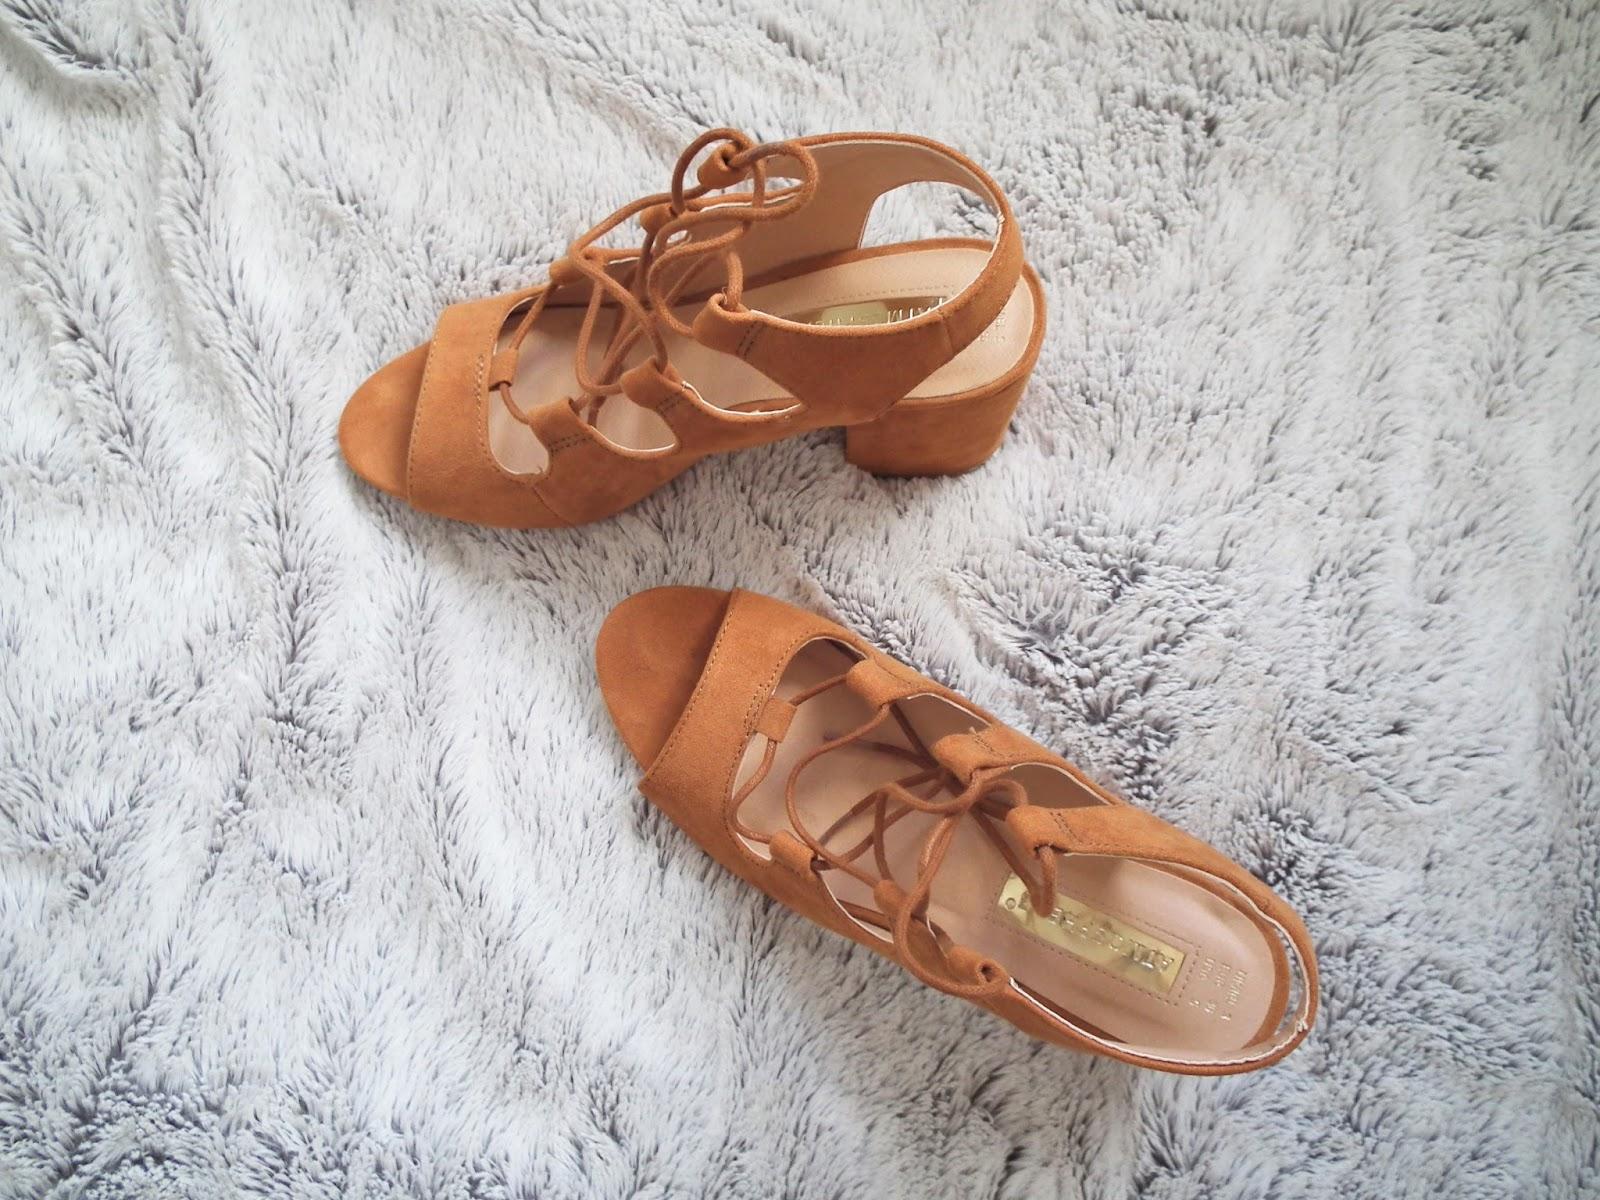 Primark Haul - Spring 2016 Laceup tan heeled sandals